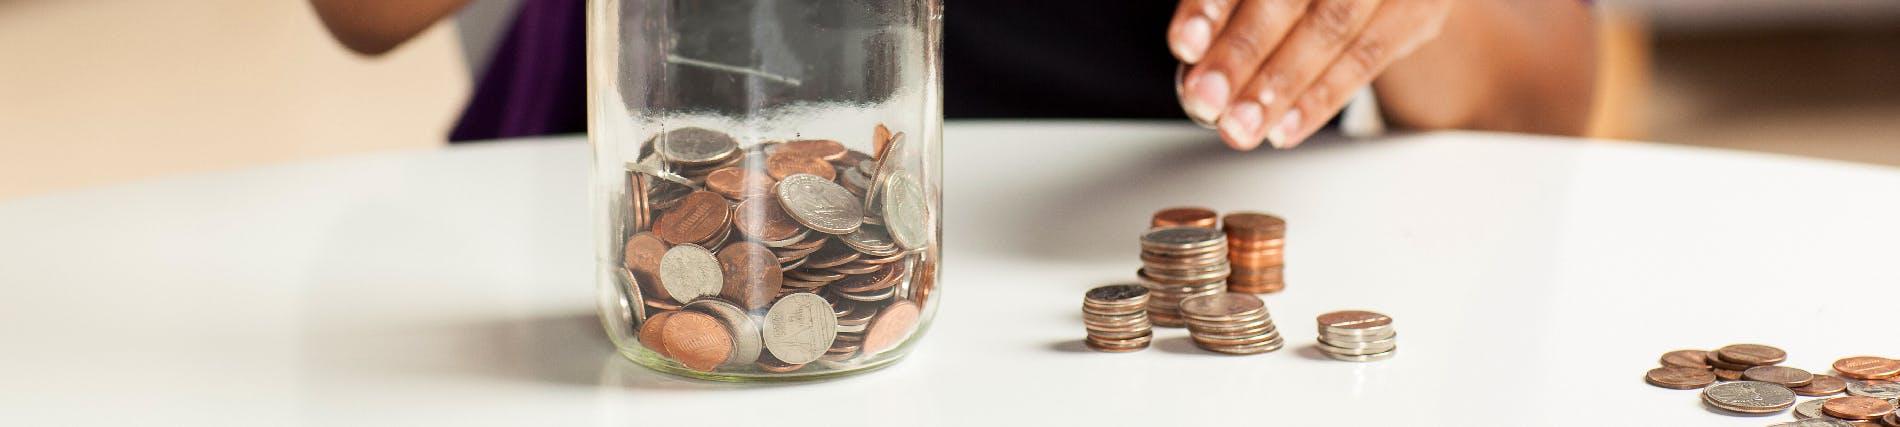 Tips de ahorro para la cuota inicial de una casa